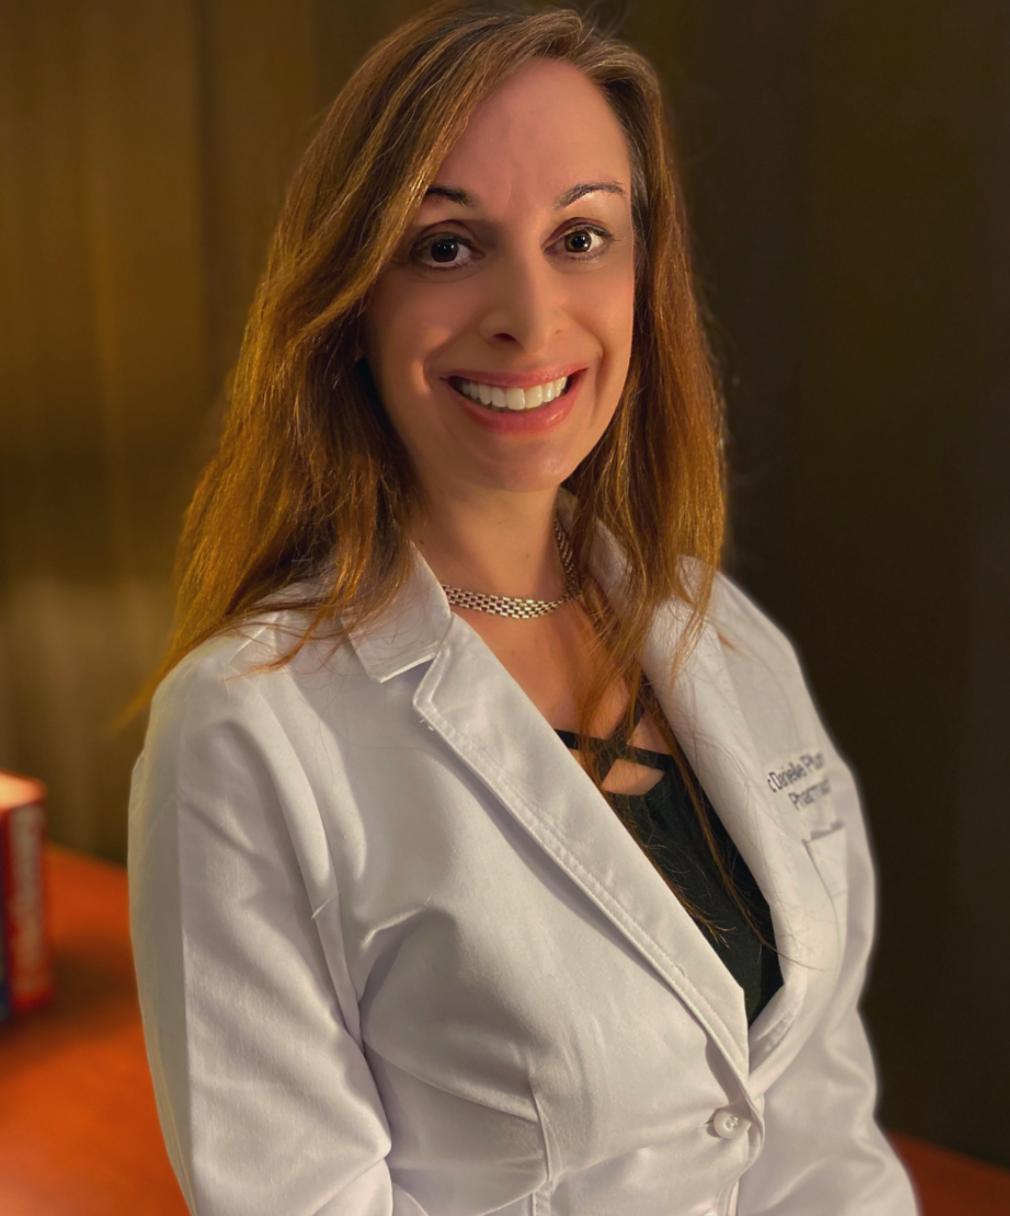 Danielle Plummer, 48, vaccine trial, next avenue